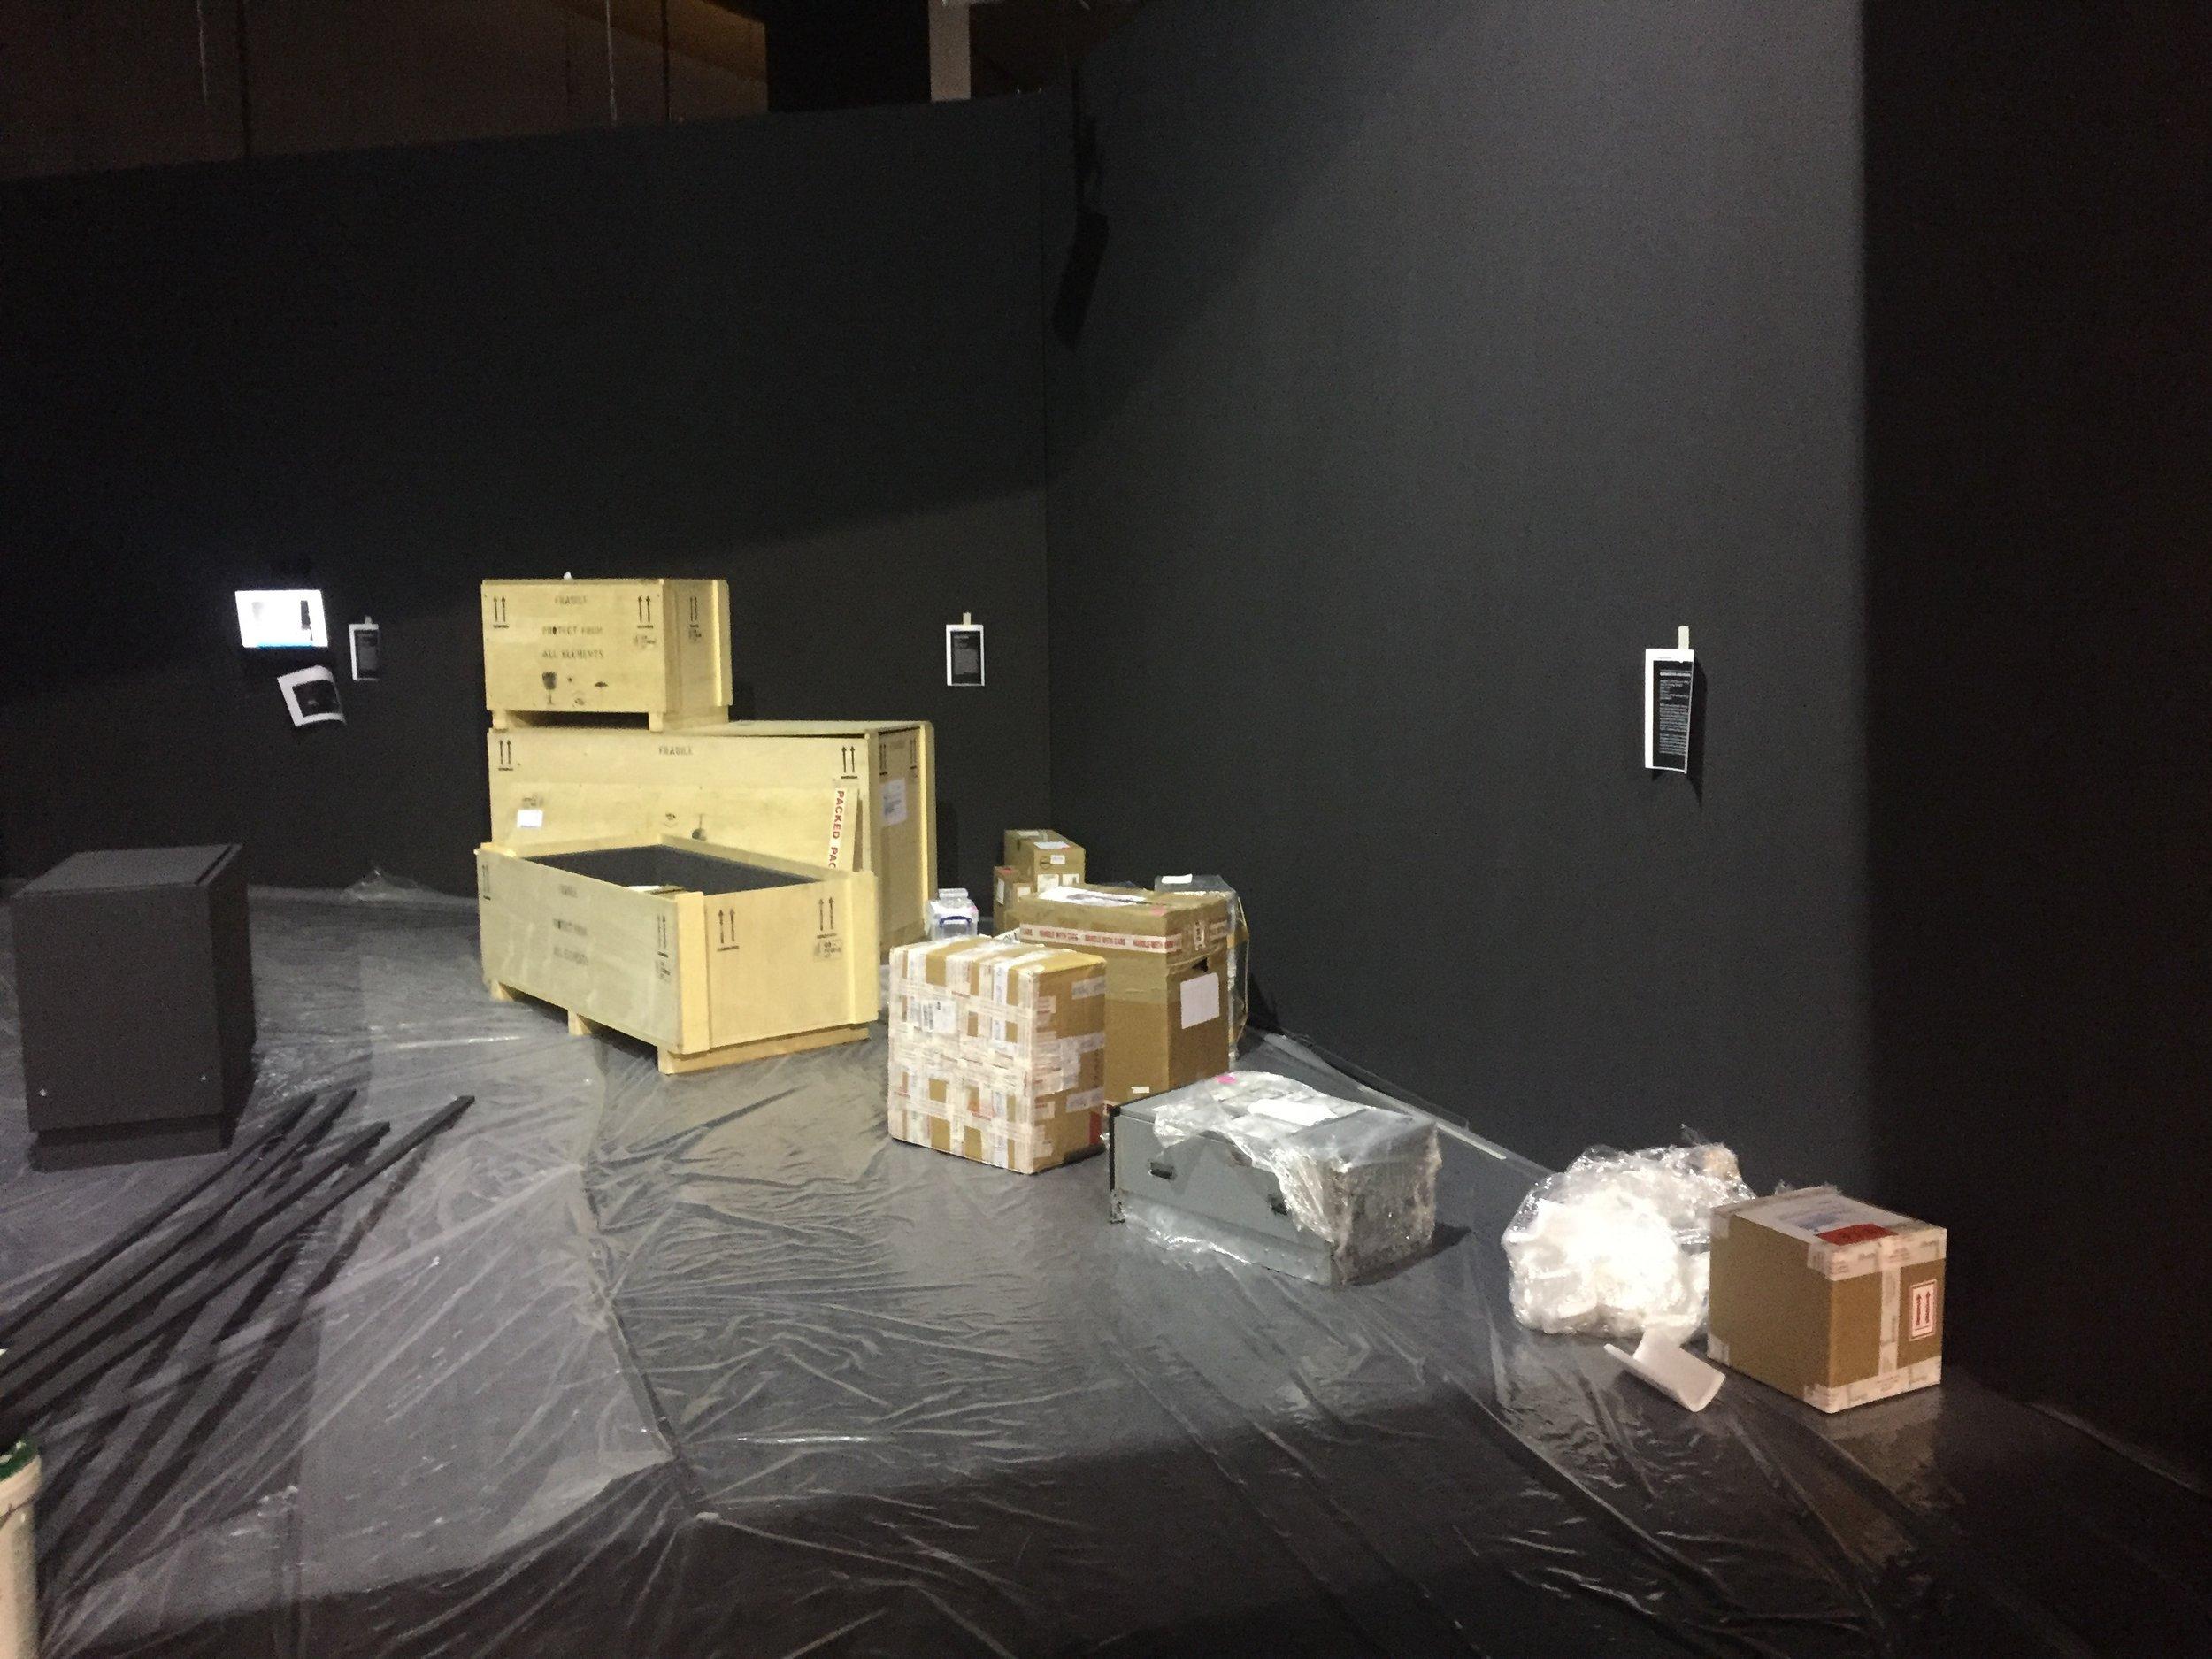 Installation of Black Shoals; Dark Matter by Lise Autogena and Joshua Portway,ArtScience Museum Singapore, Big Bang Data, 2016